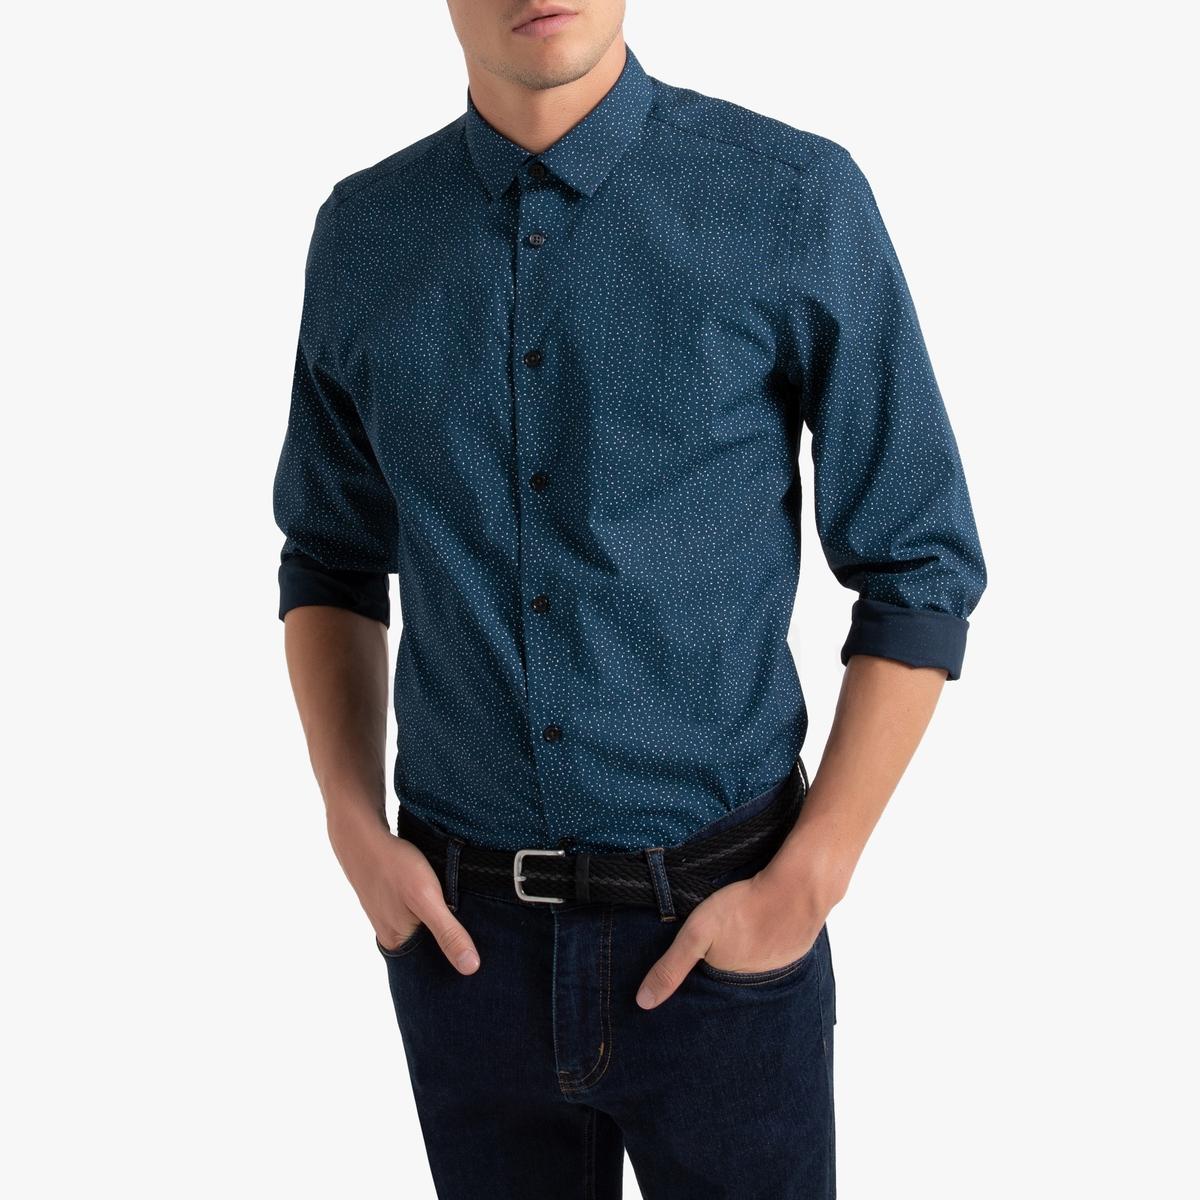 Рубашка La Redoute Узкого покроя с рисунком и длинными рукавами 47/48 синий блуза la redoute с рисунком и длинными рукавами s синий